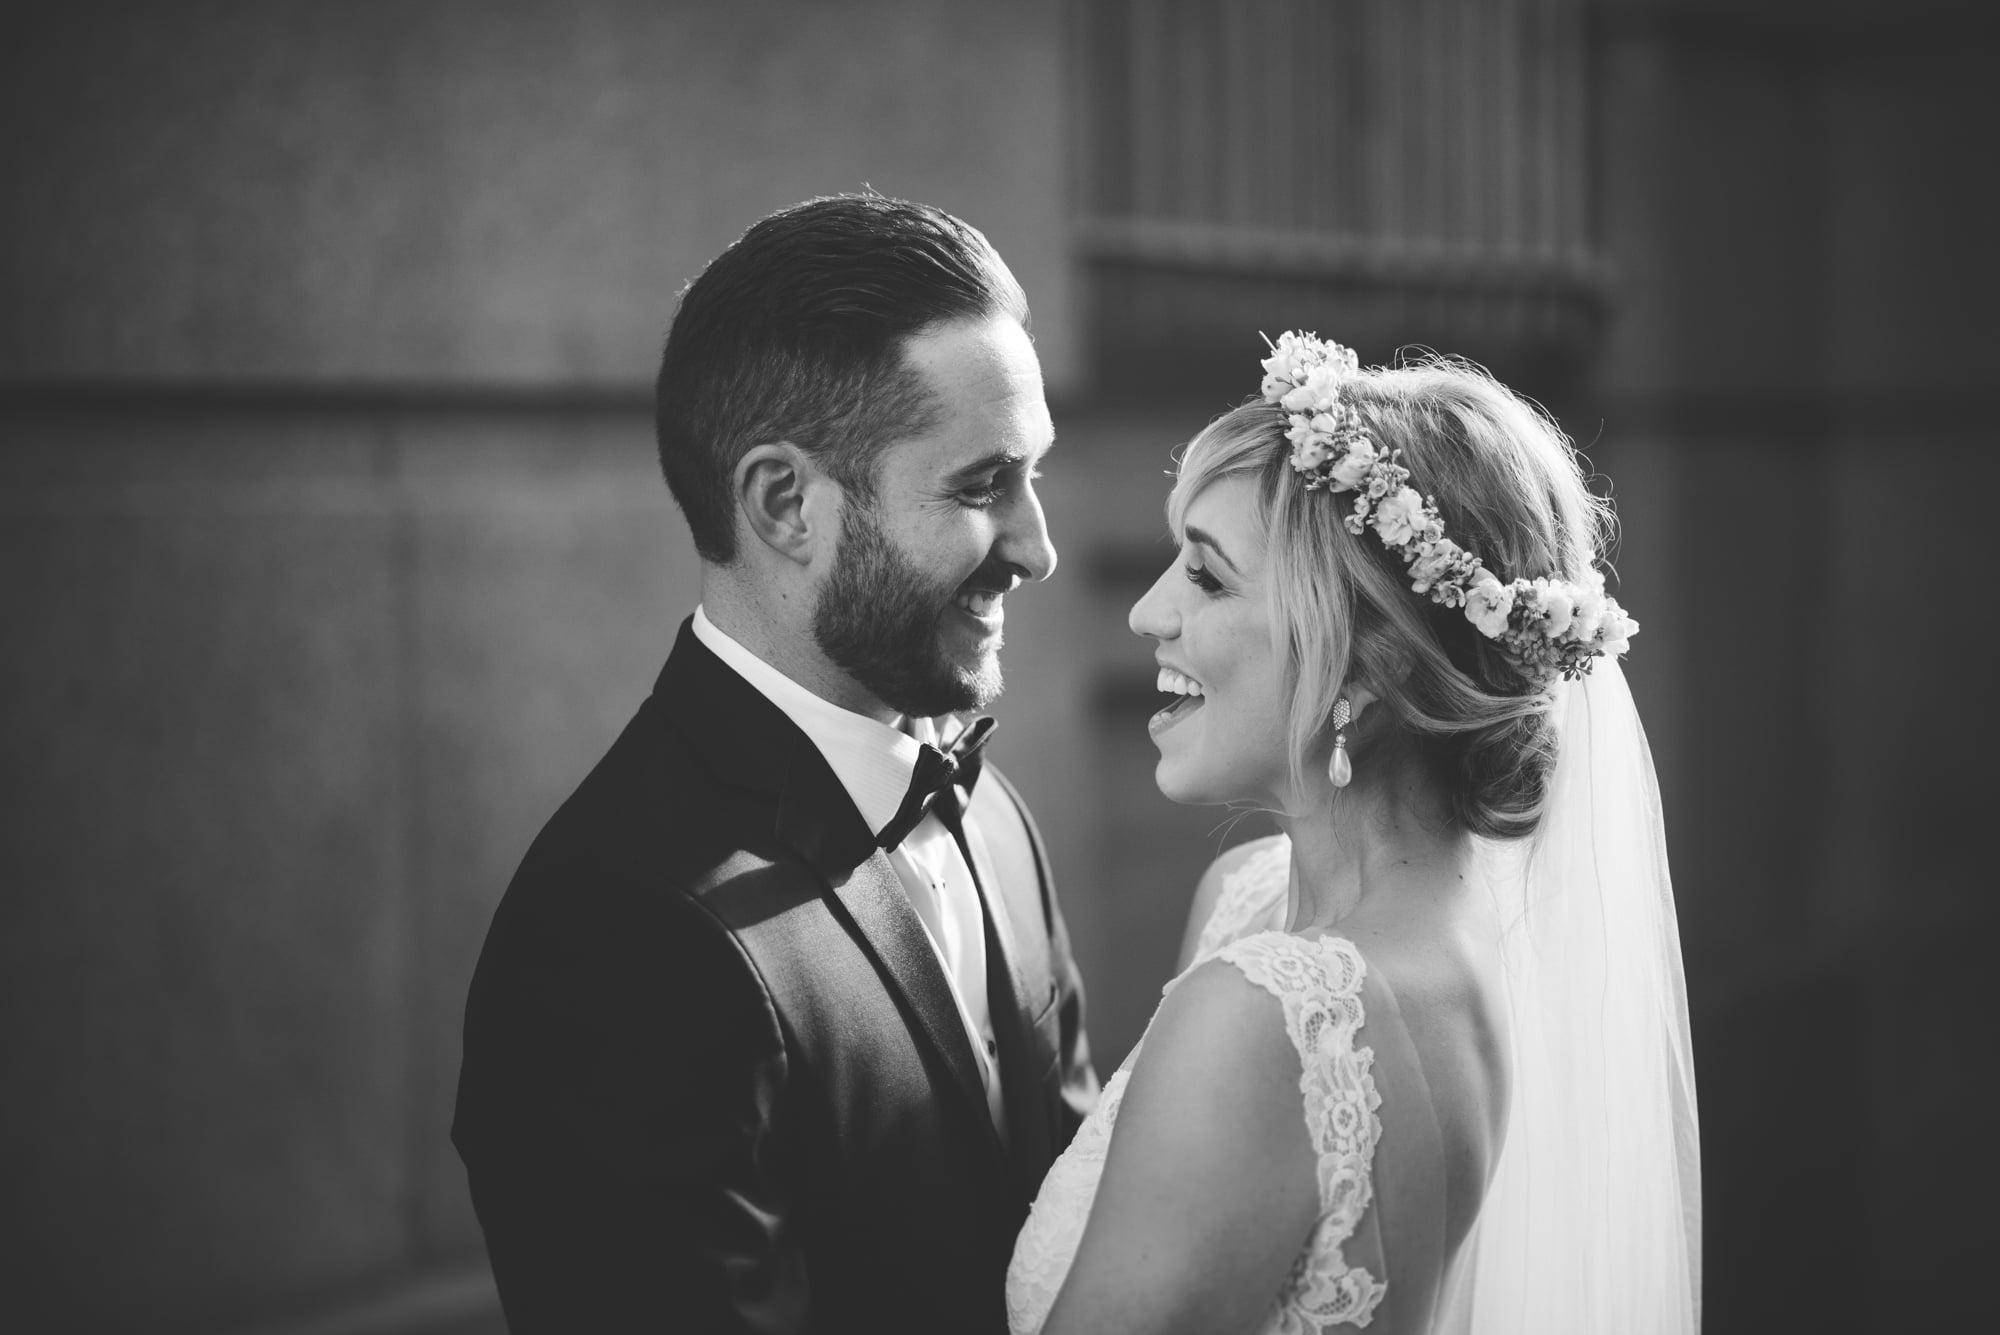 ©Isaiah & Taylor Photography - The Elms Mansion Wedding - New Orleans, Louisiana-21.jpg